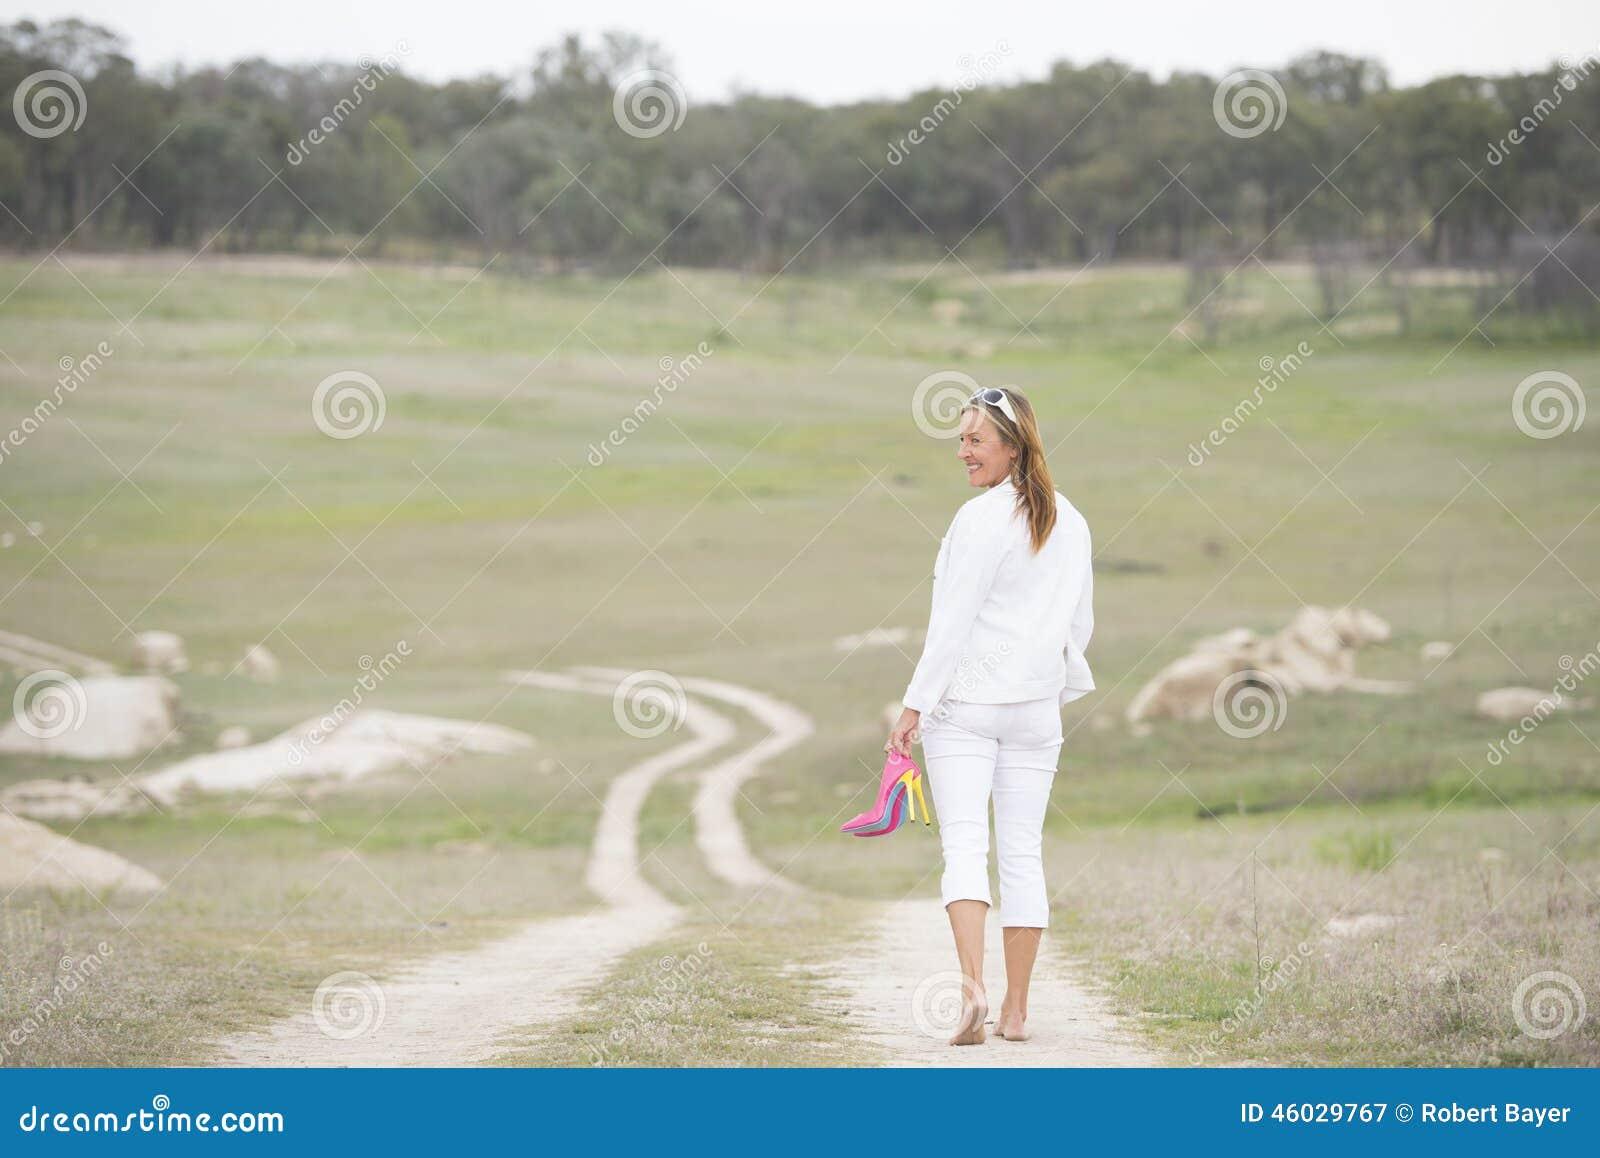 woman walking bare feet outdoor holding high heels stock image